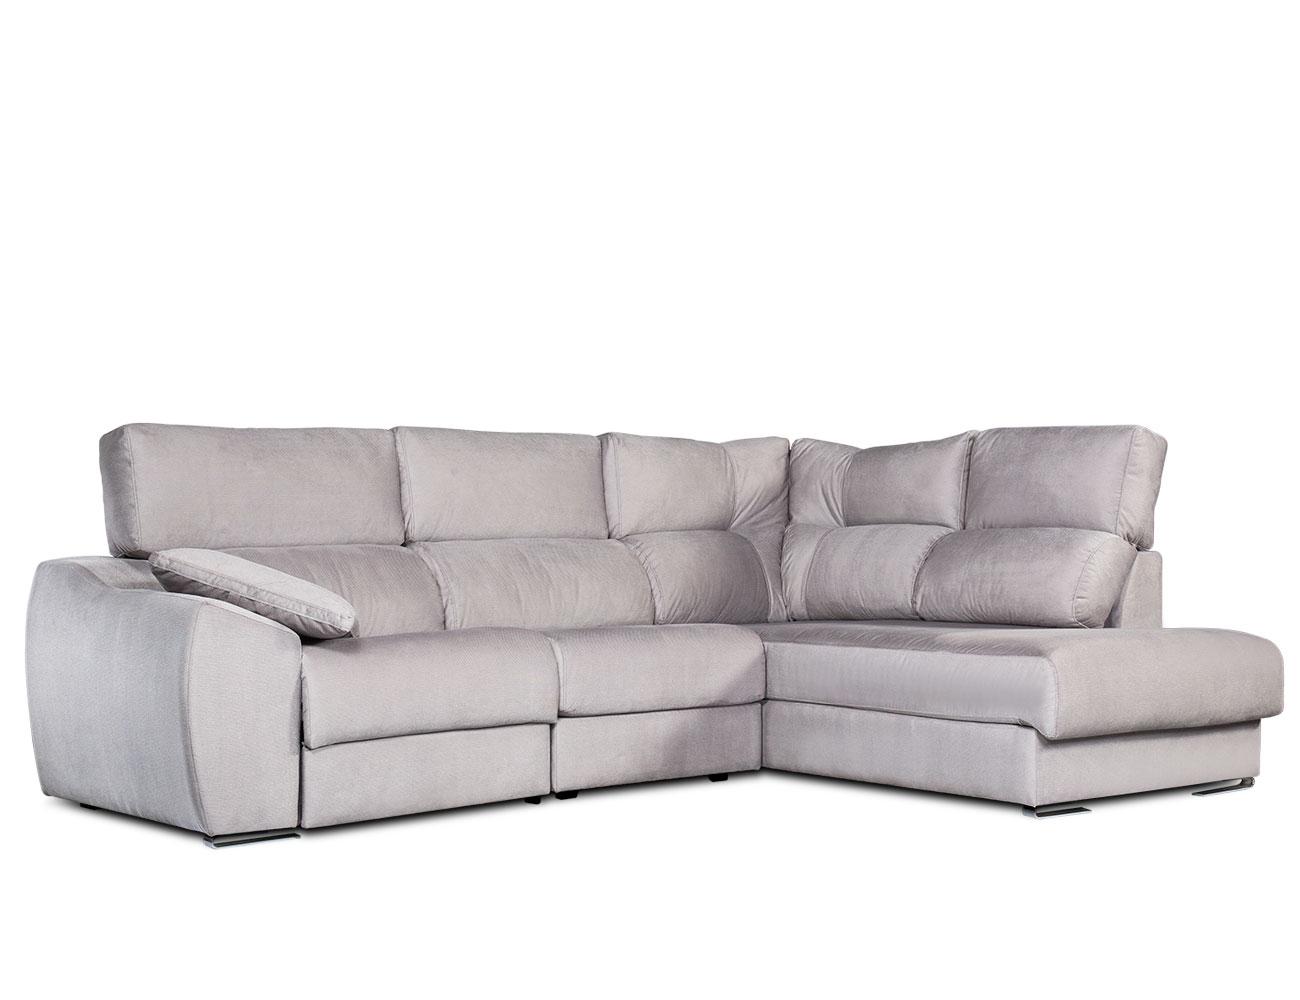 Sofa chaiselongue rincon electrico7